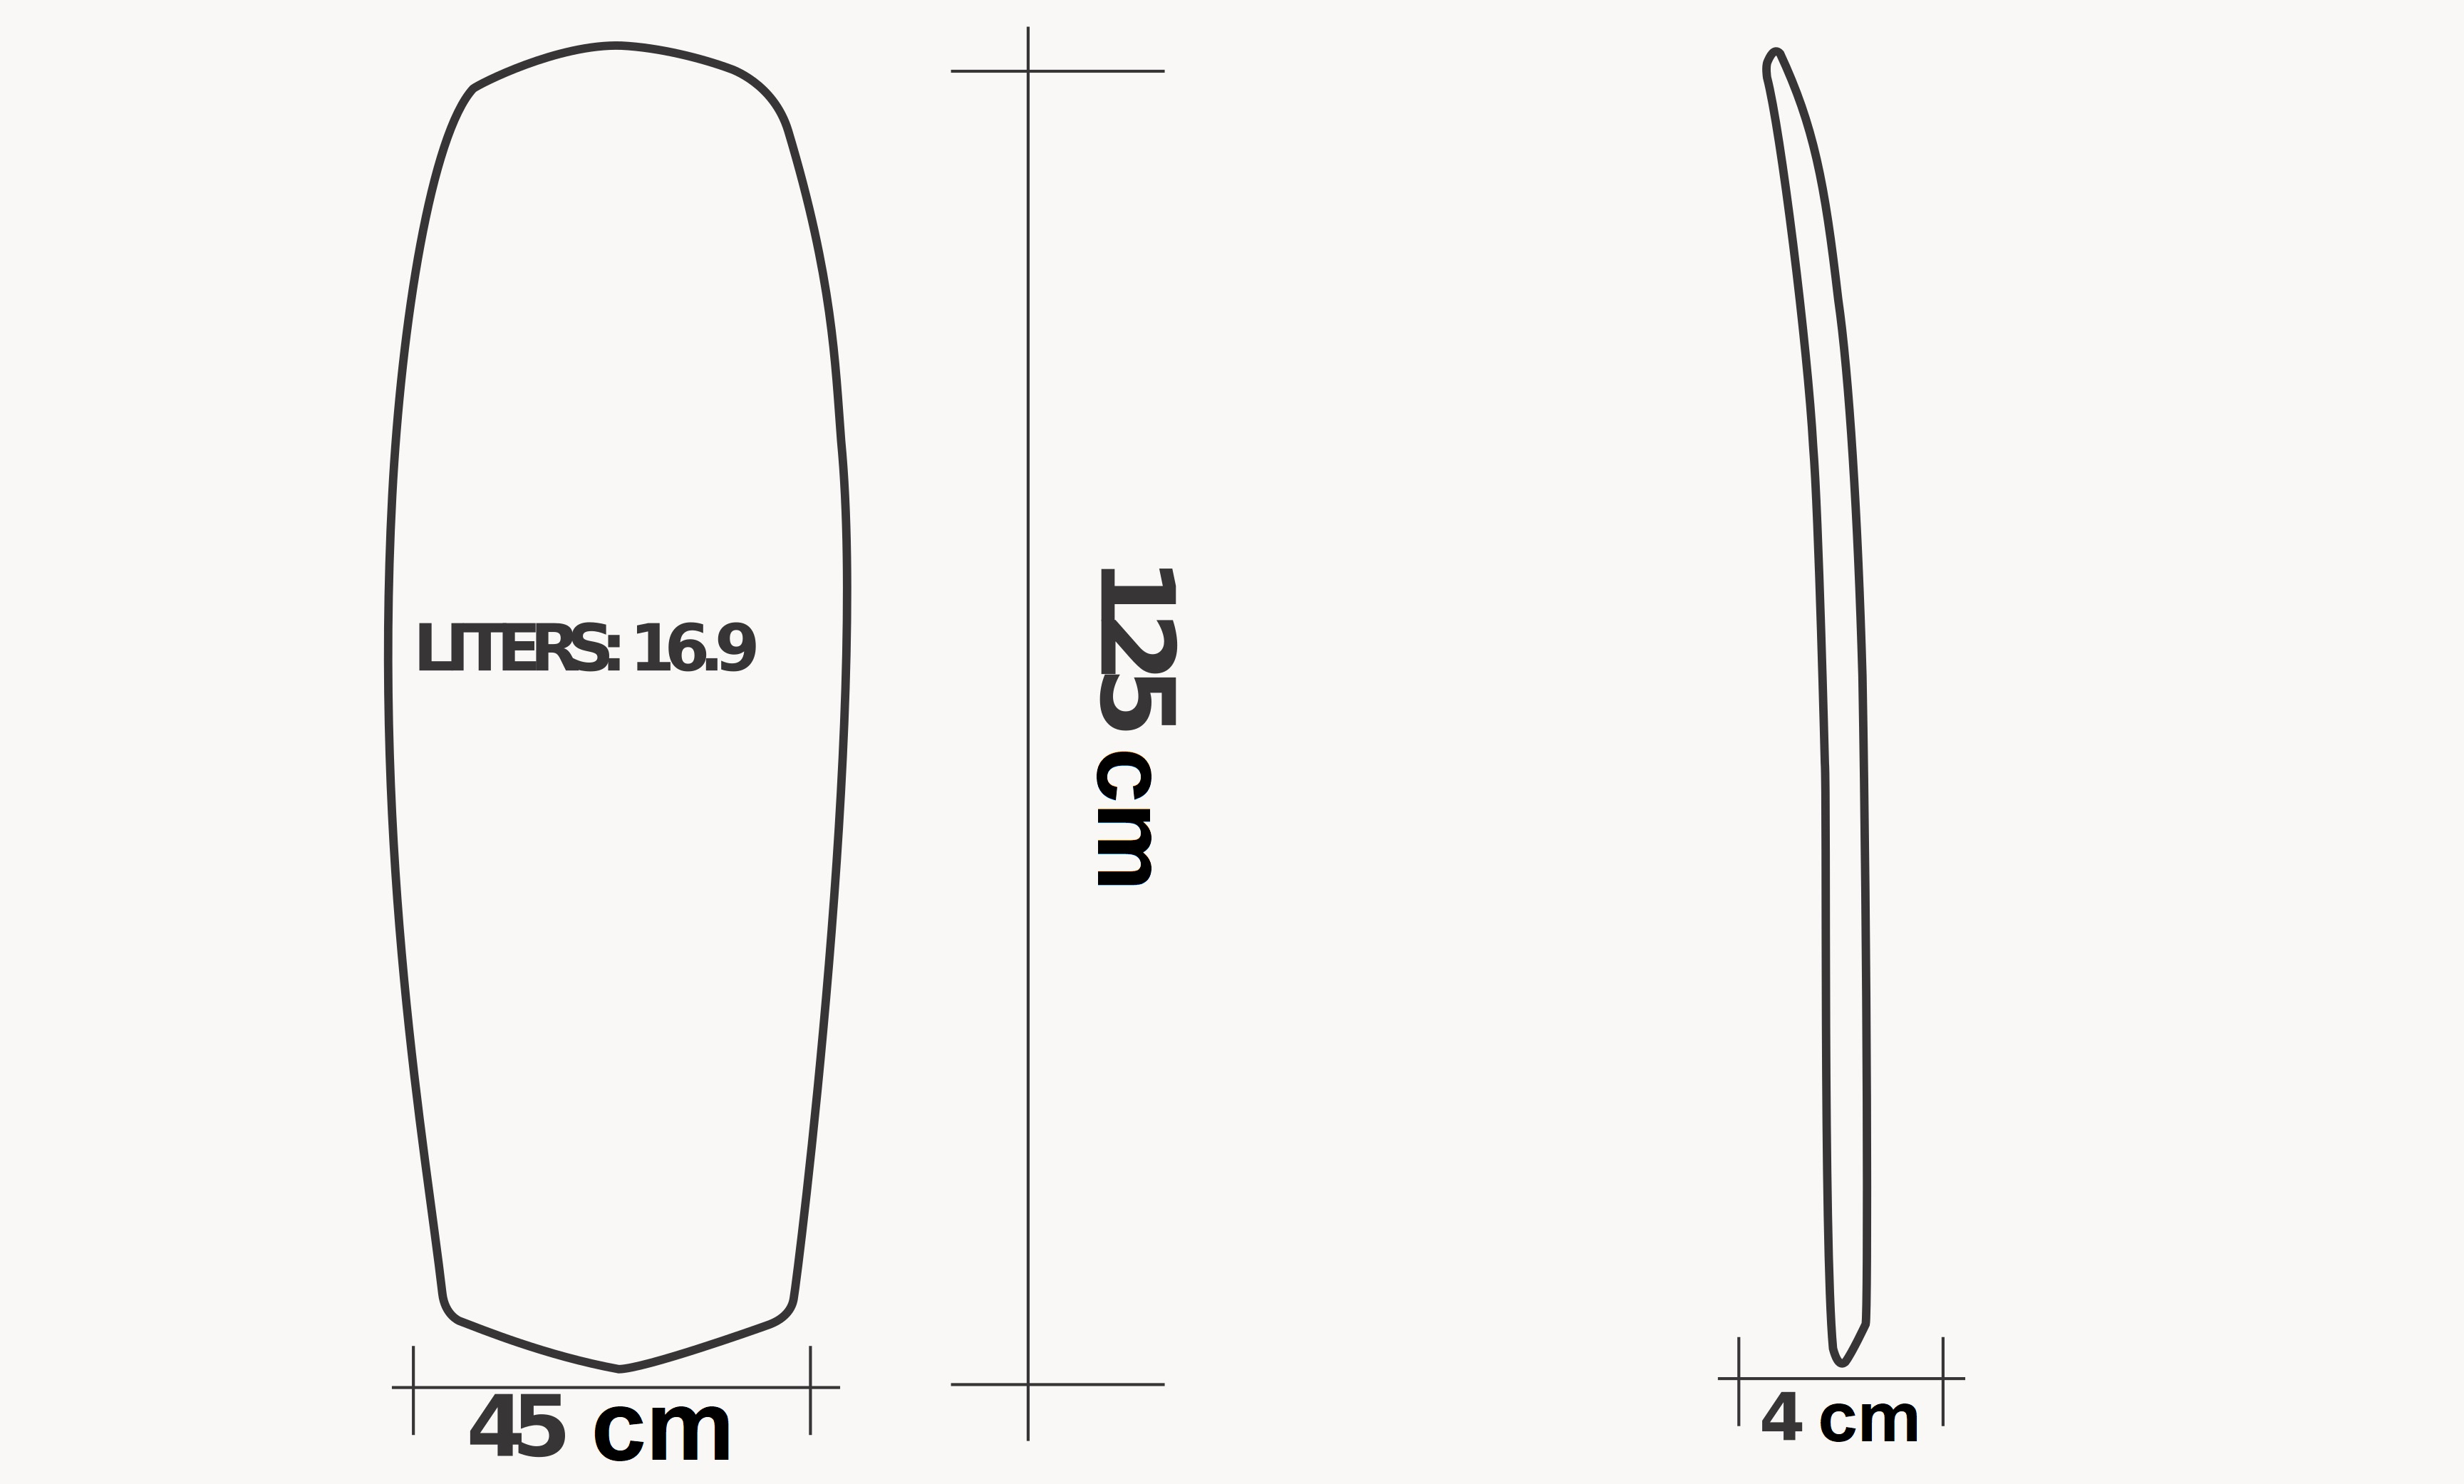 Board T38 Carbon Rail Kite specs